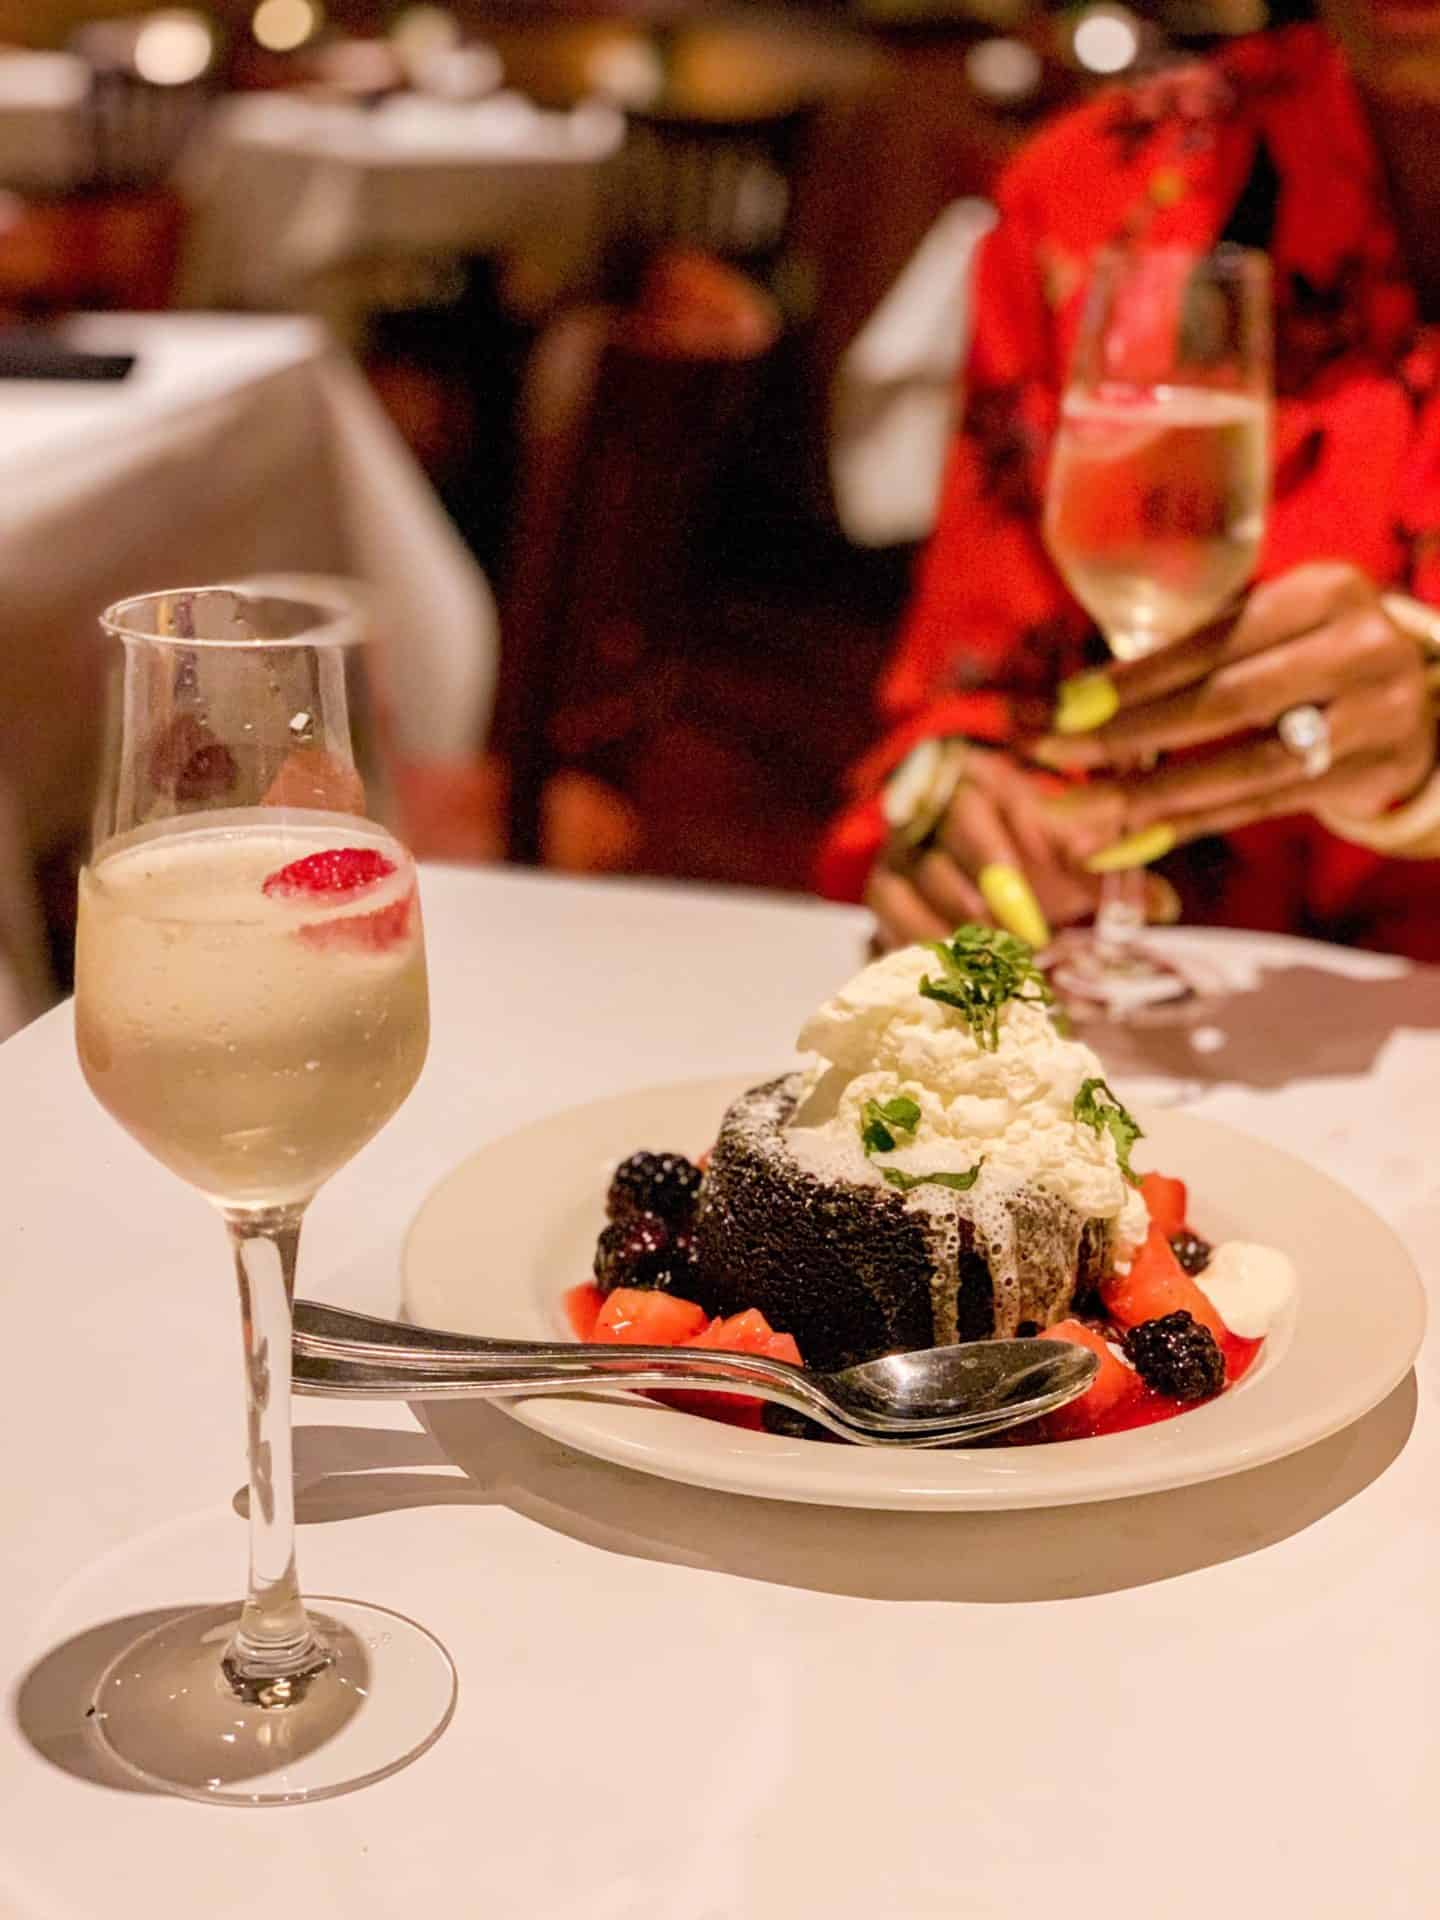 ShaundaNecole.com Our Valentine's Dinner At Bonefish Grill- Chocolate Lava Cake